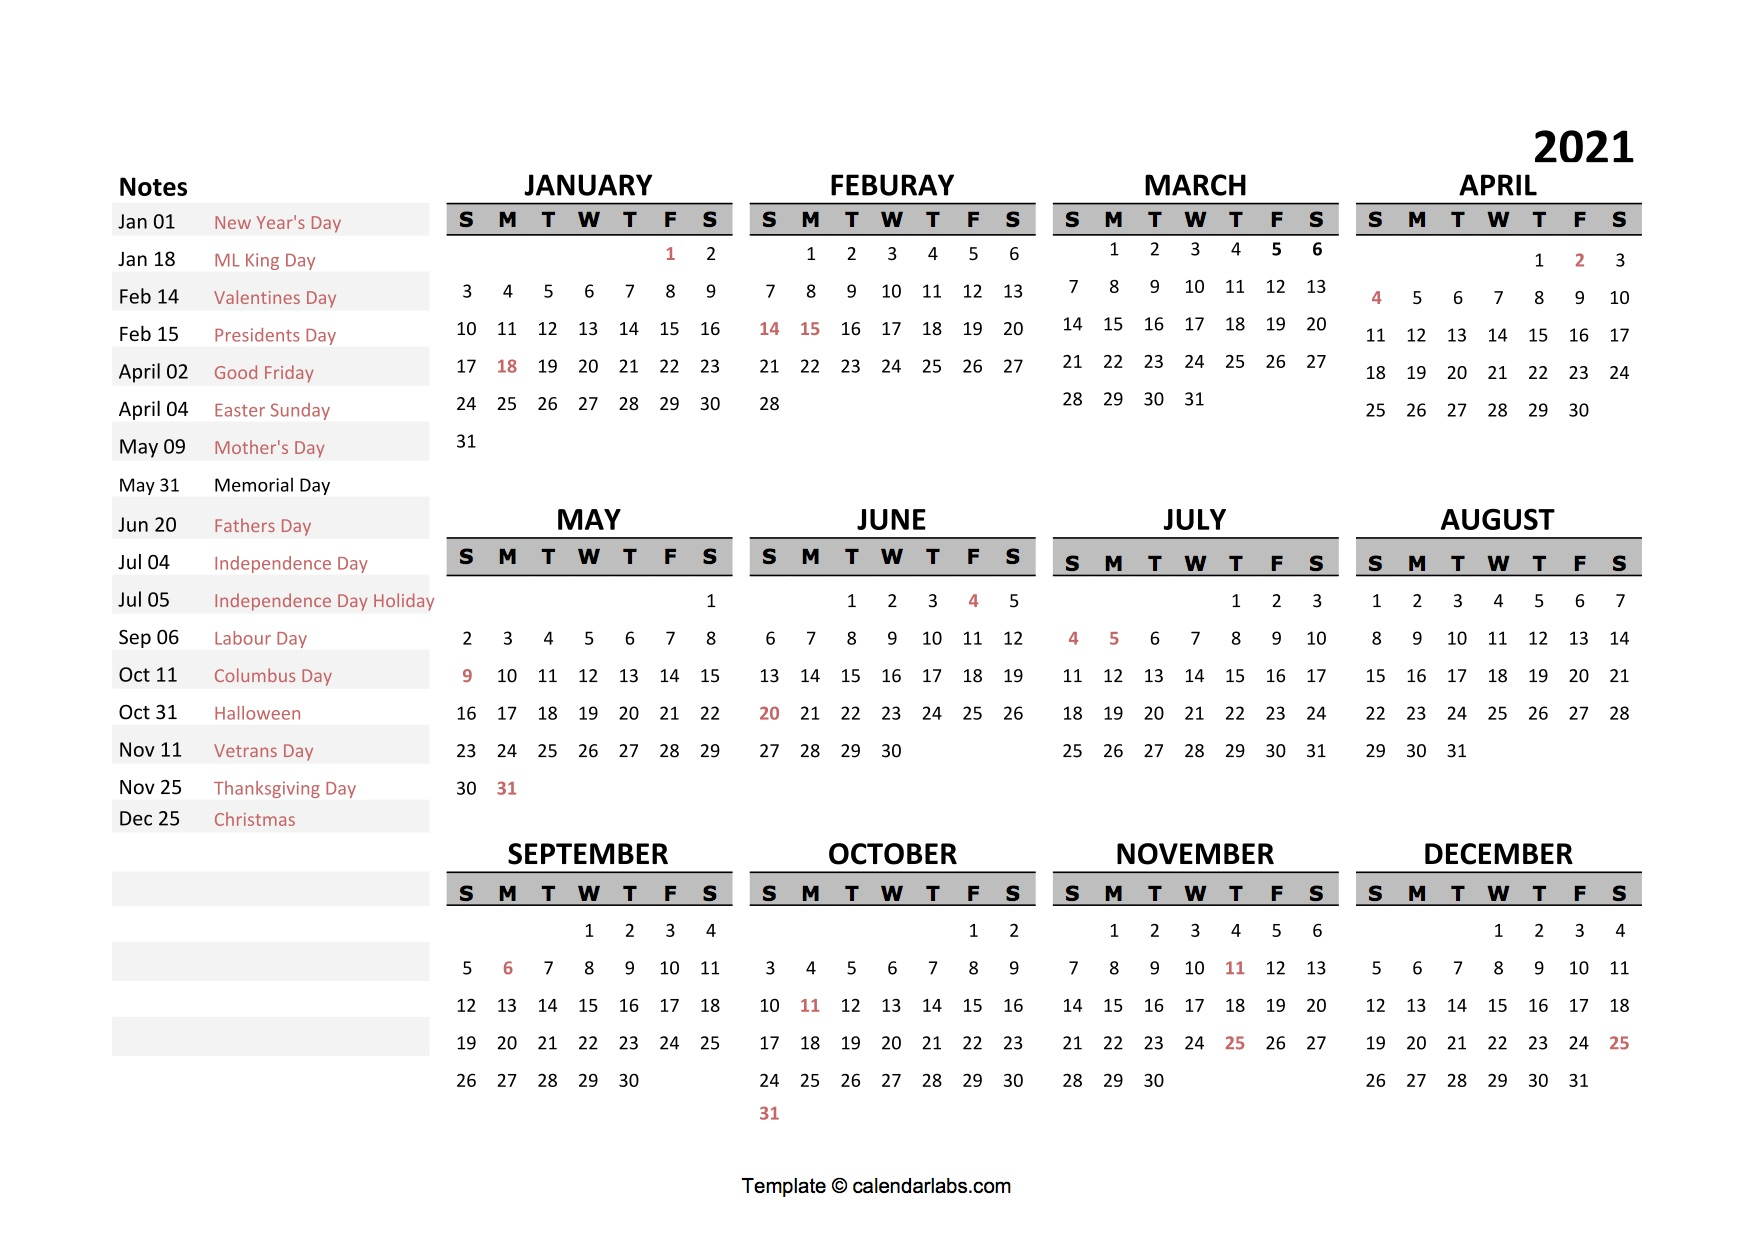 2021 Yearly Google Docs Calendar Template - Free Printable ...